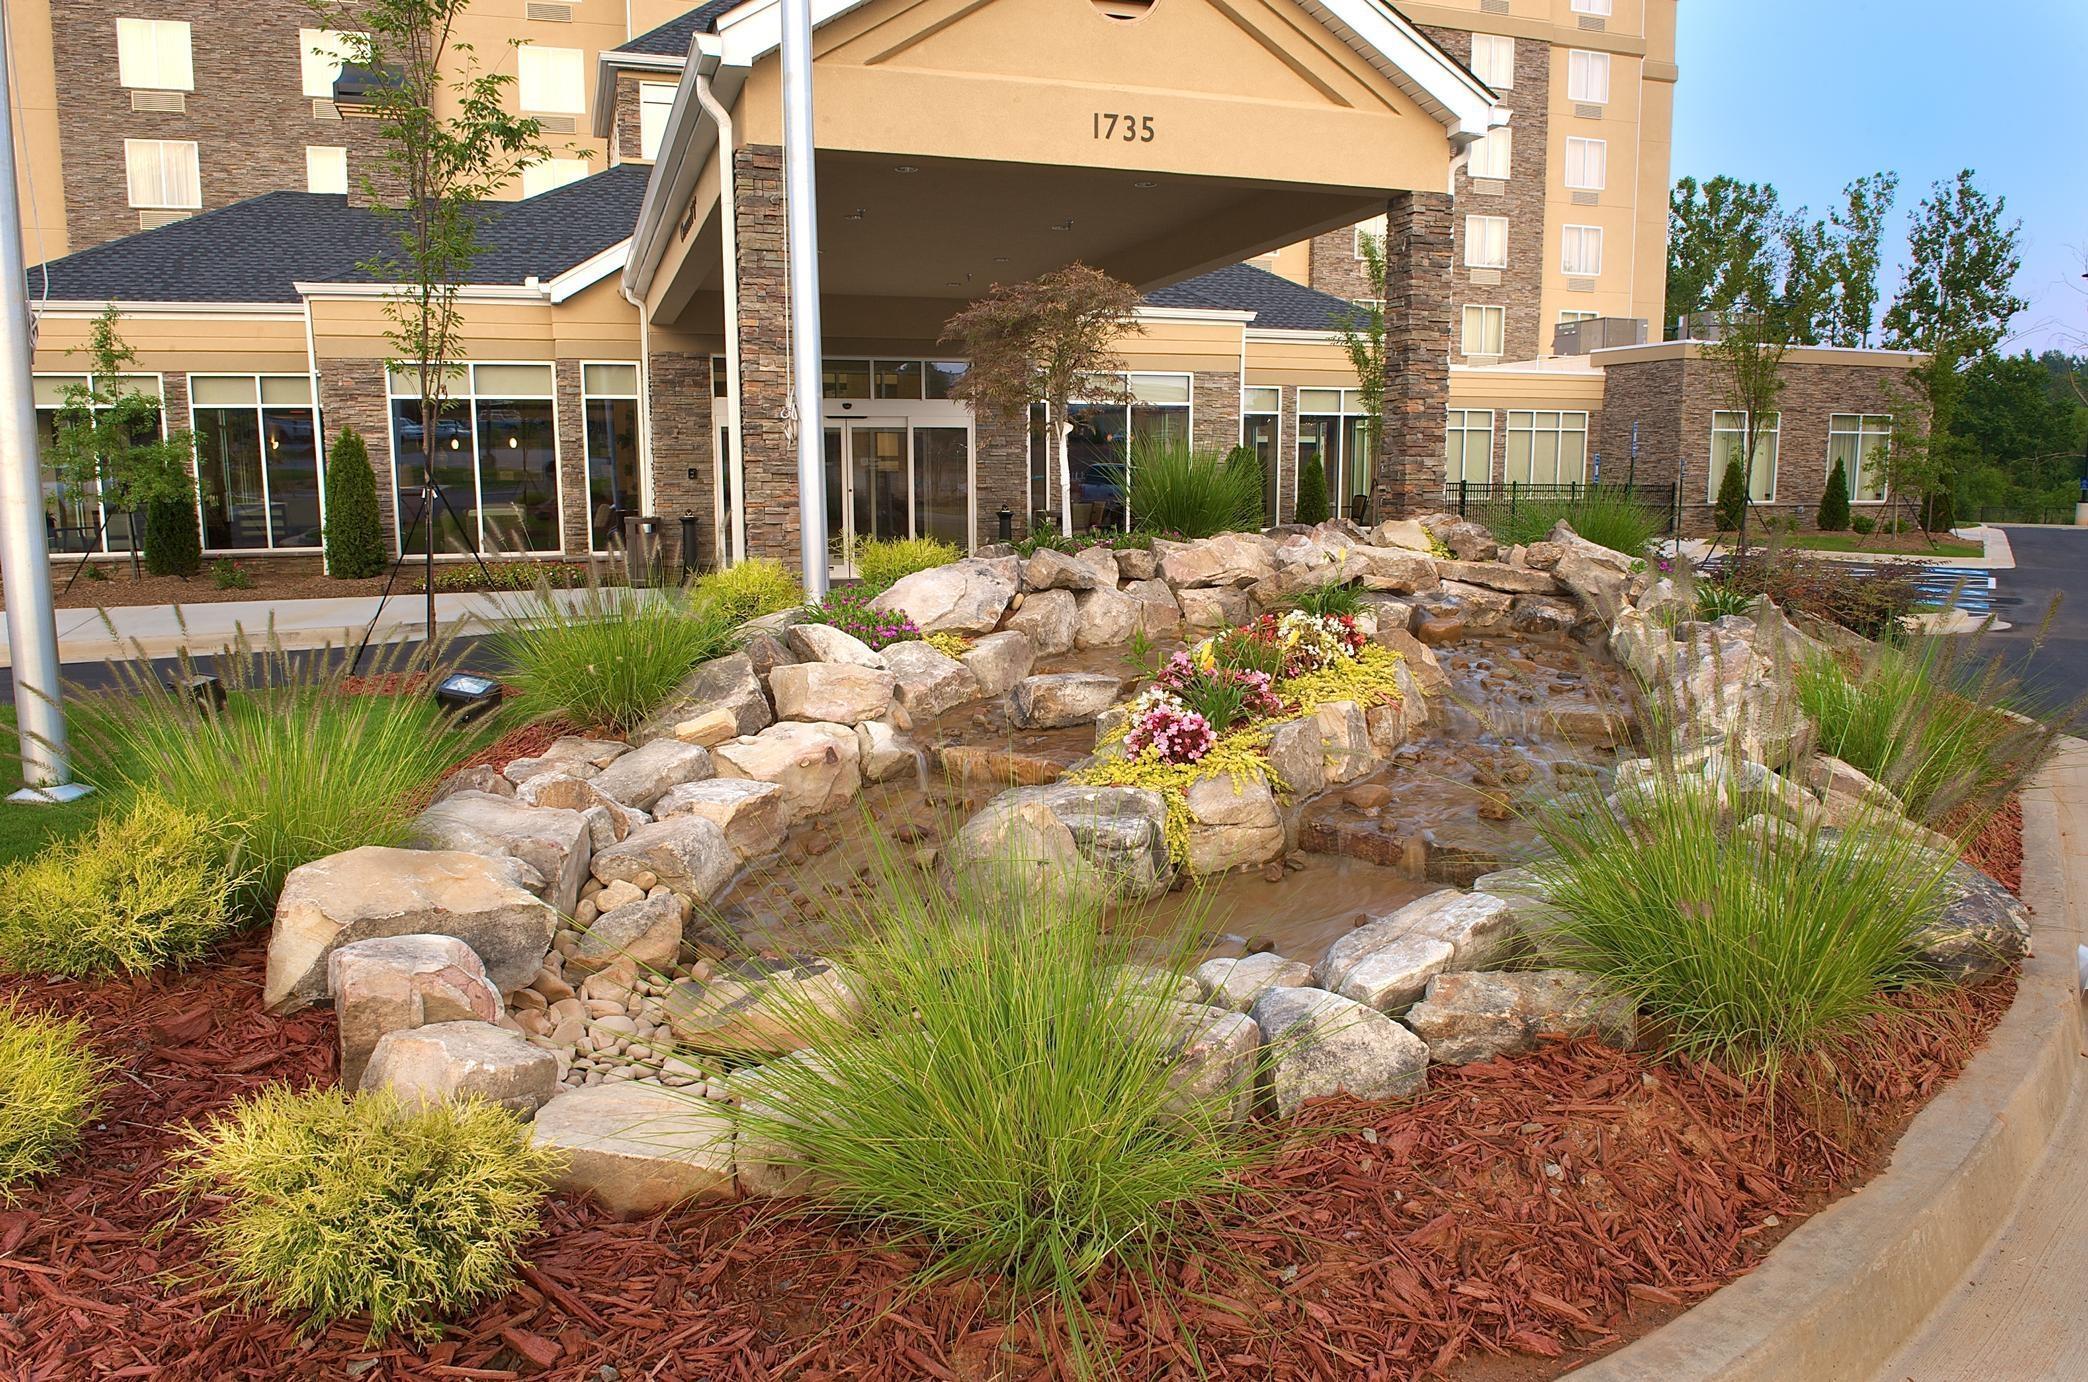 Hilton Garden Inn Gainesville image 21